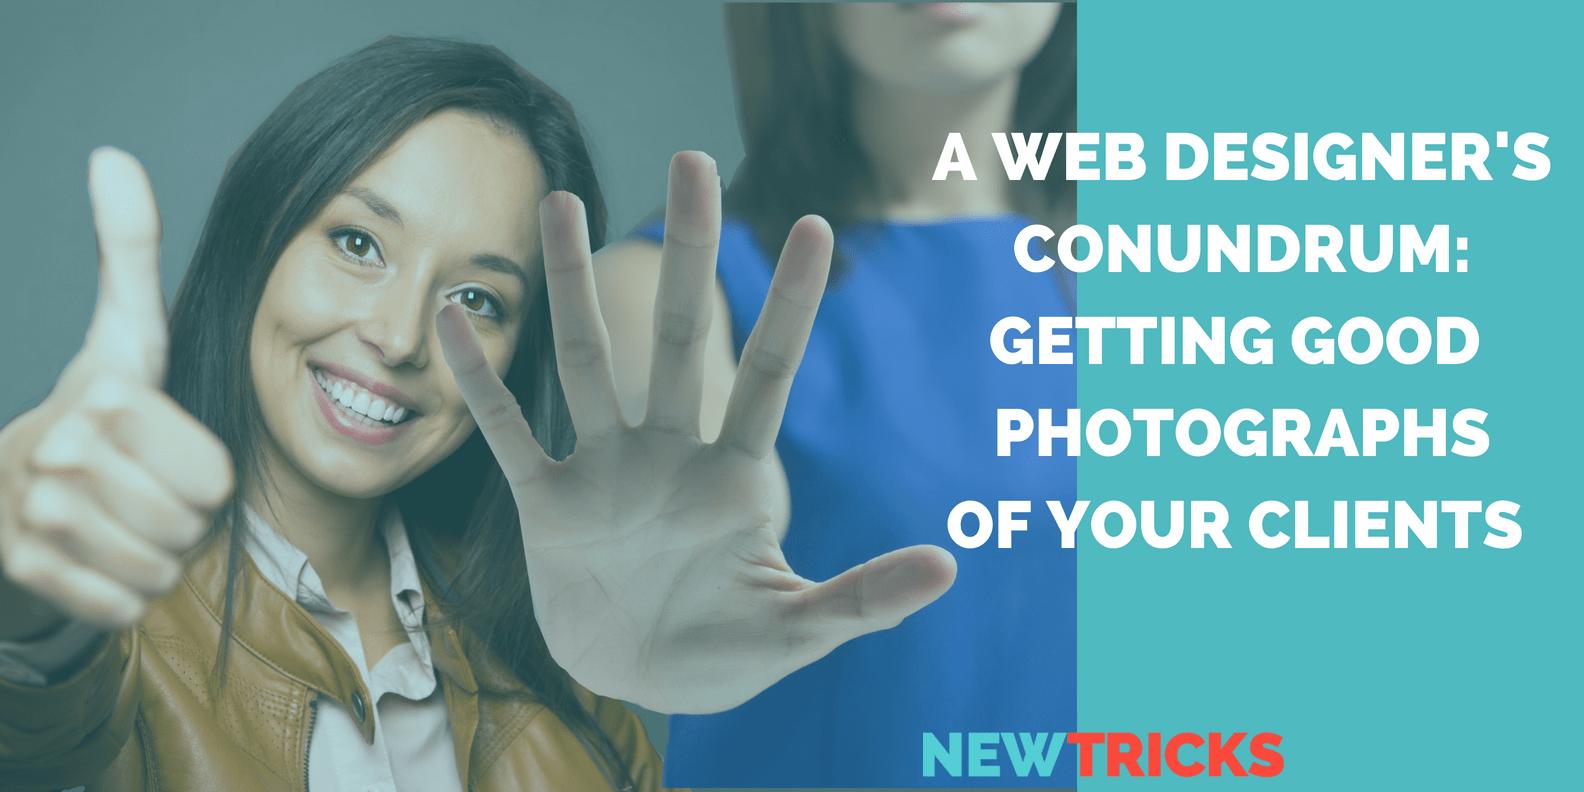 Web Designer's Conundrum. Getting Client Photographs